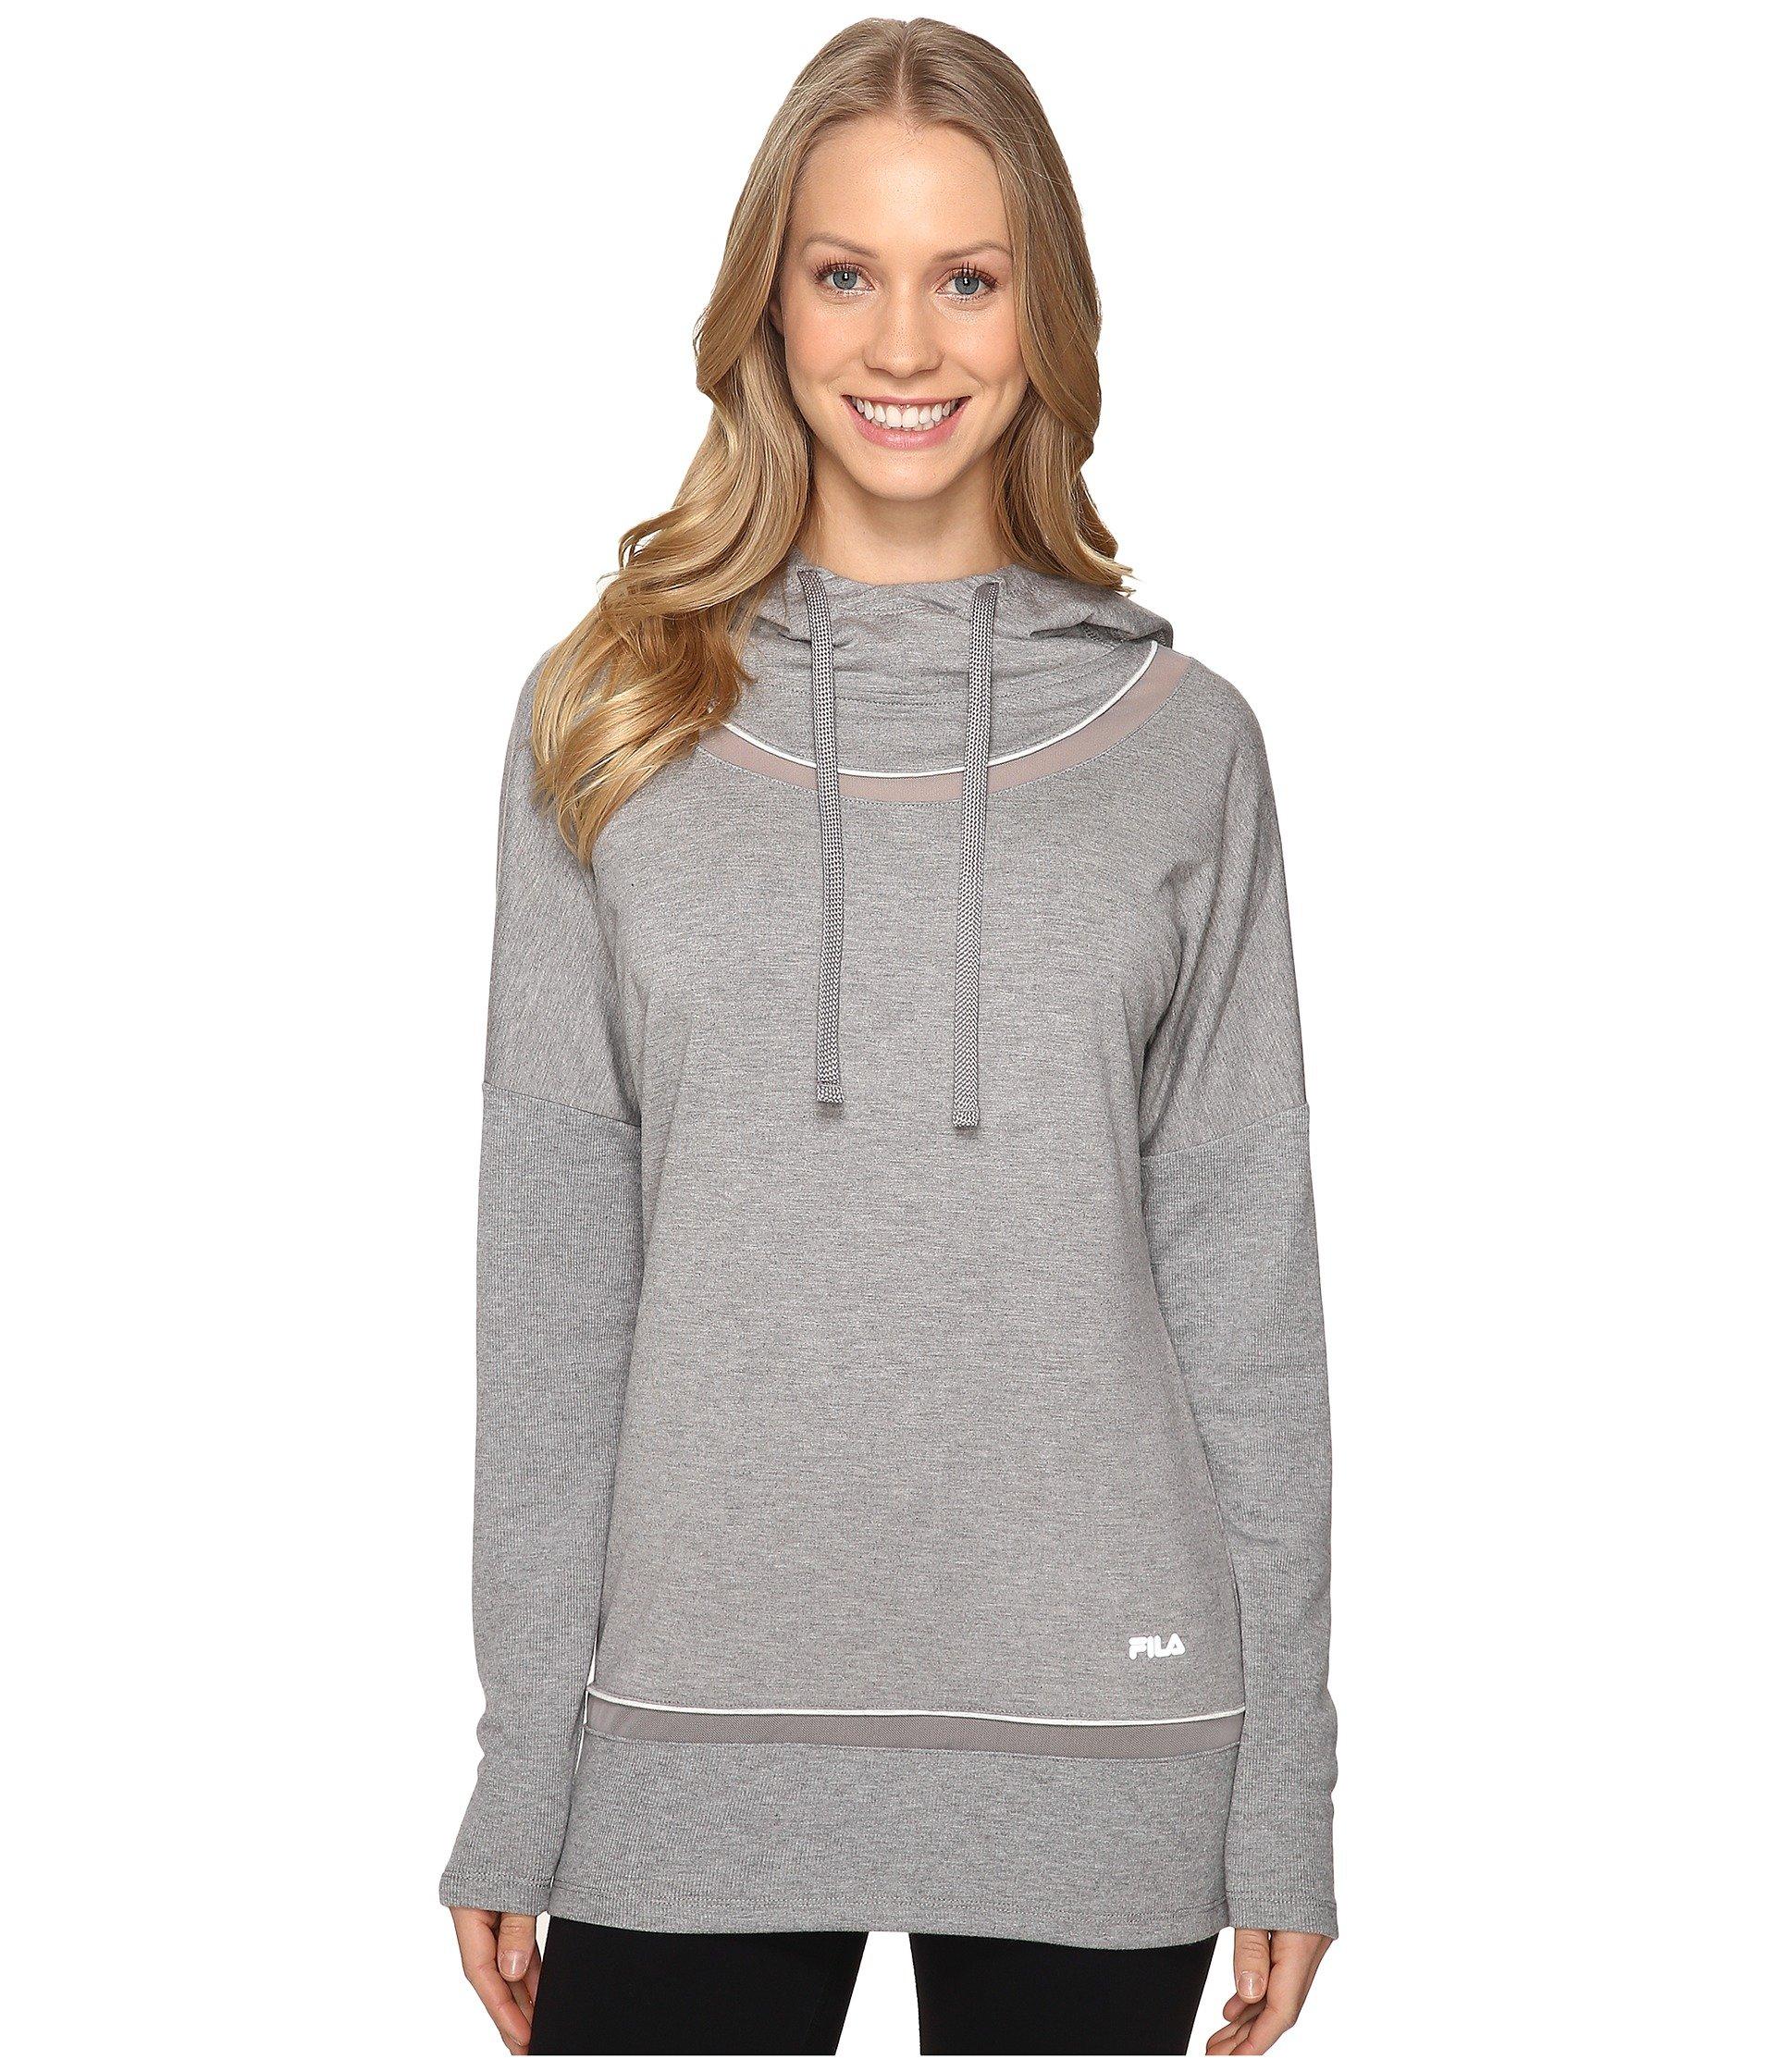 Buzo o Chaqueta para Mujer Fila Lux Yoga Pullover  + Fila en VeoyCompro.net